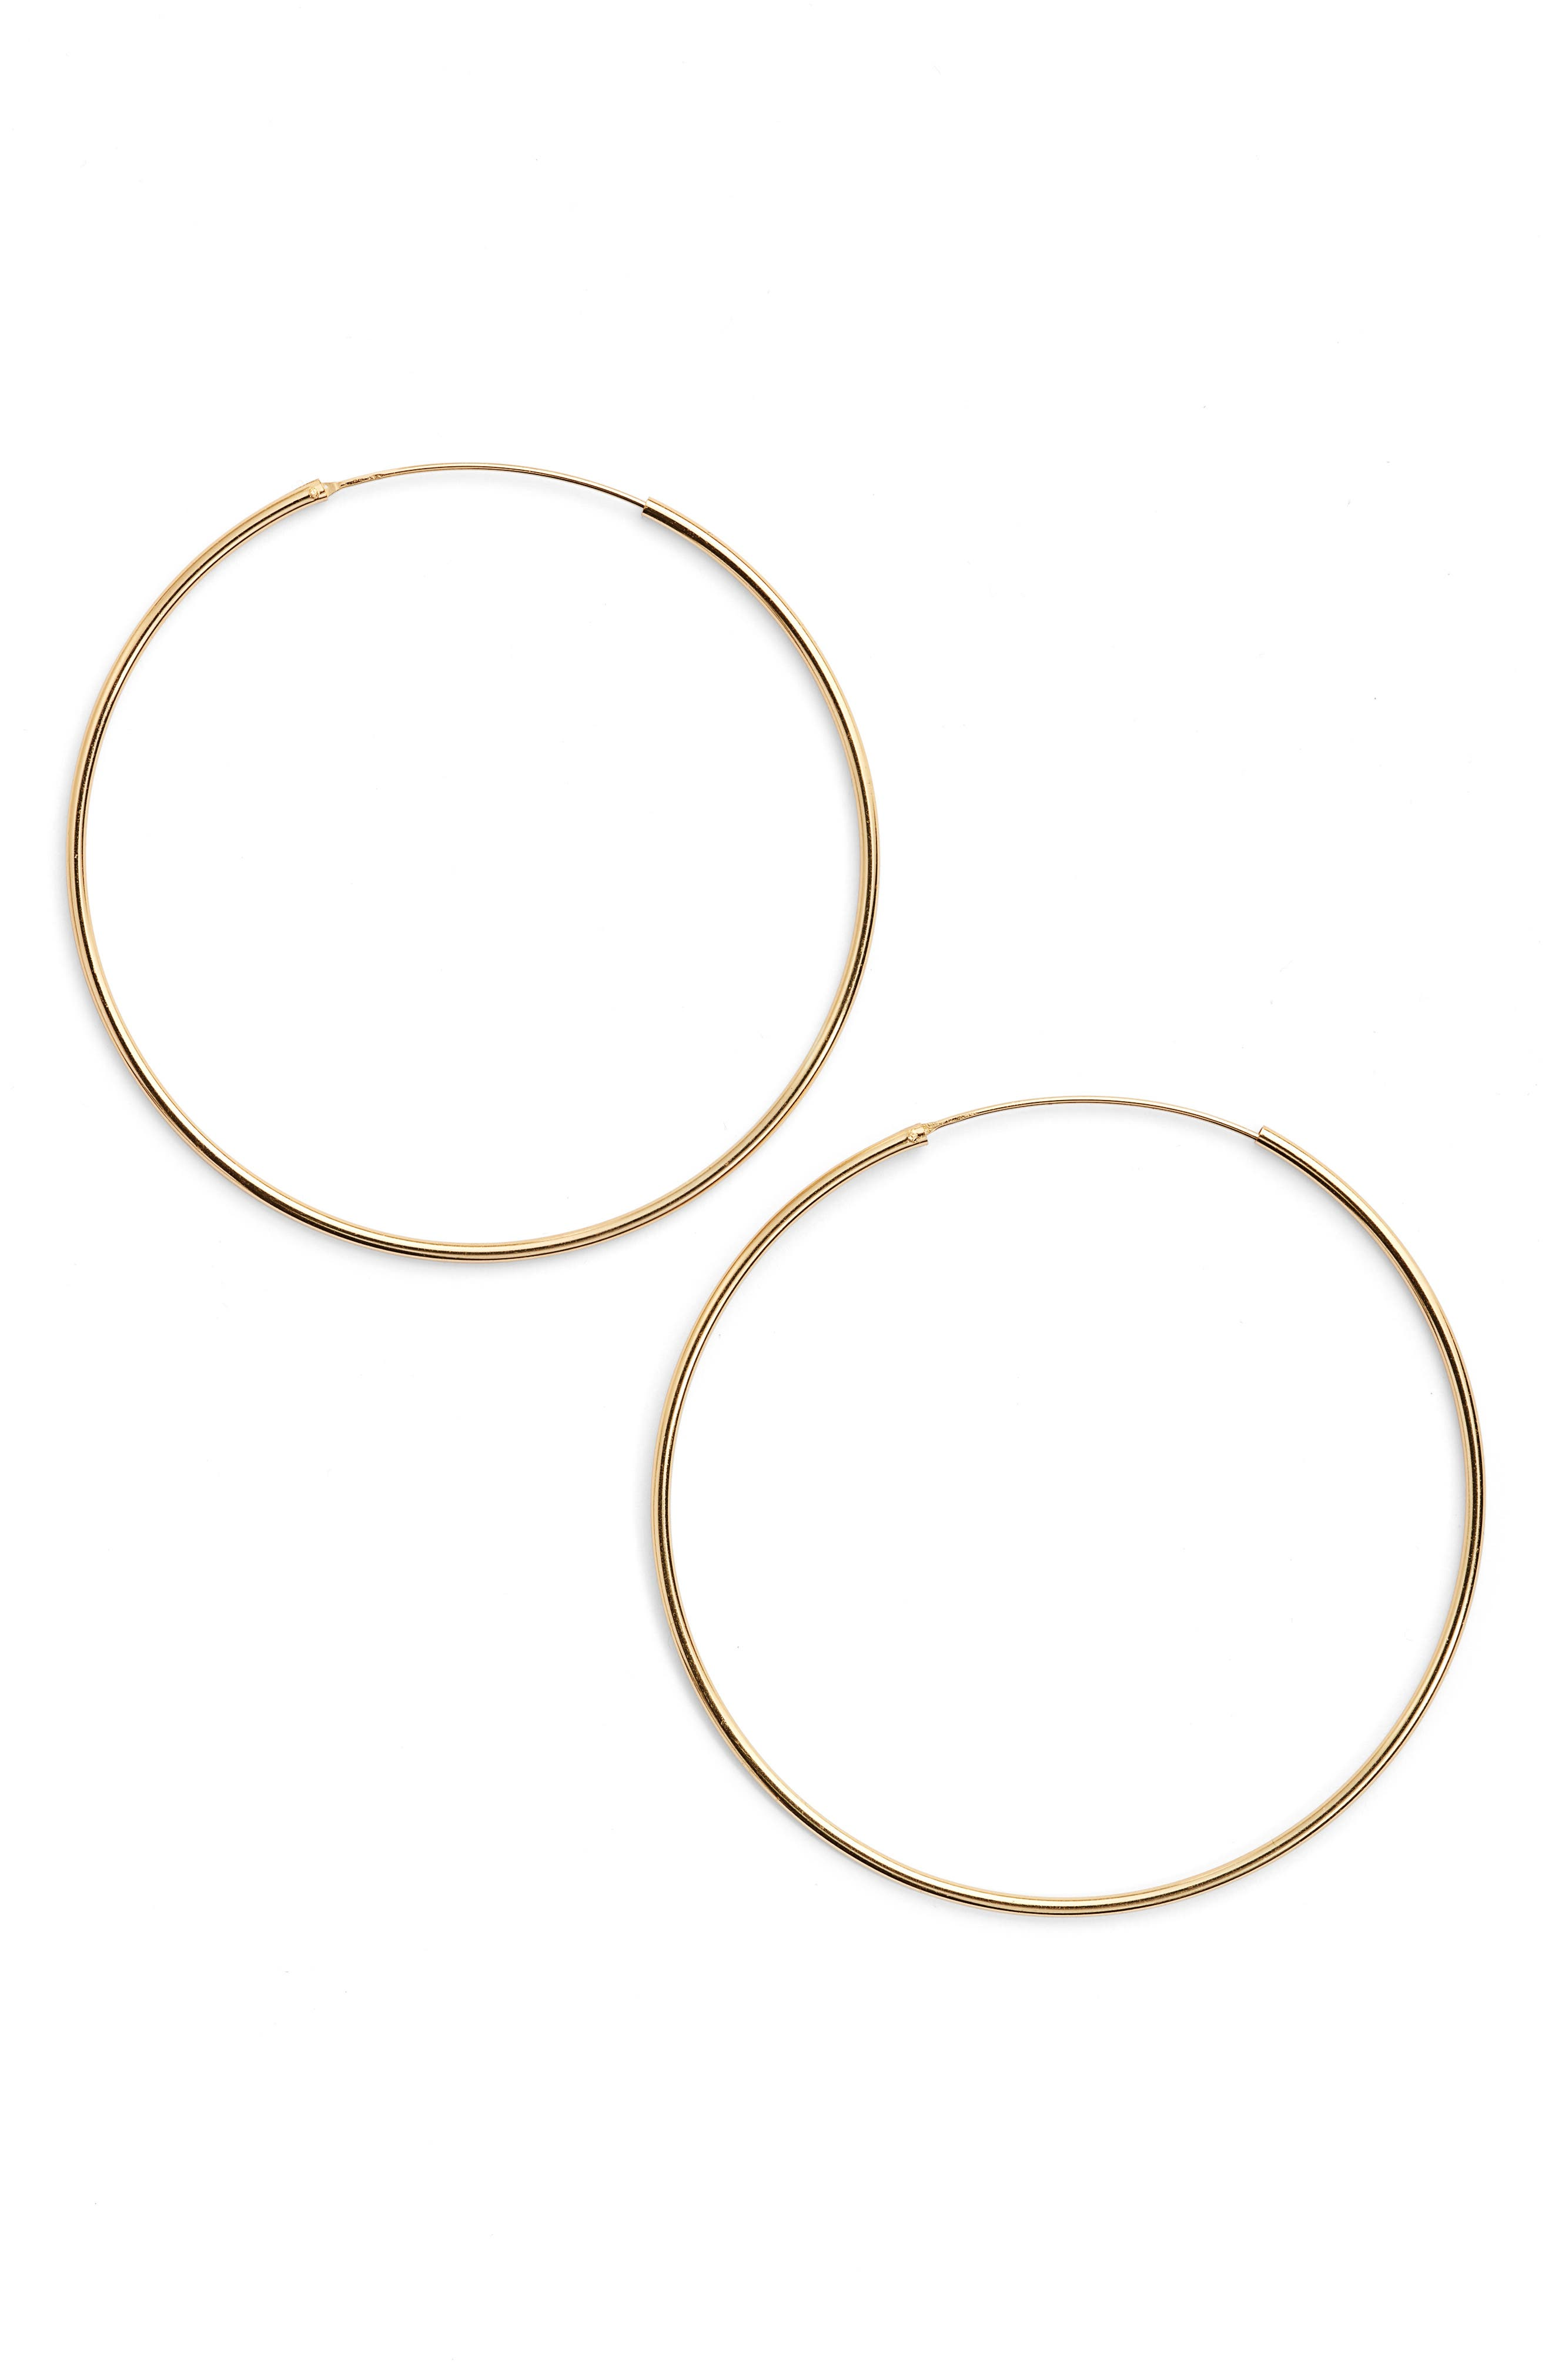 Alternate Image 1 Selected - Argento Vivo Endless Extra Large Hoop Earrings